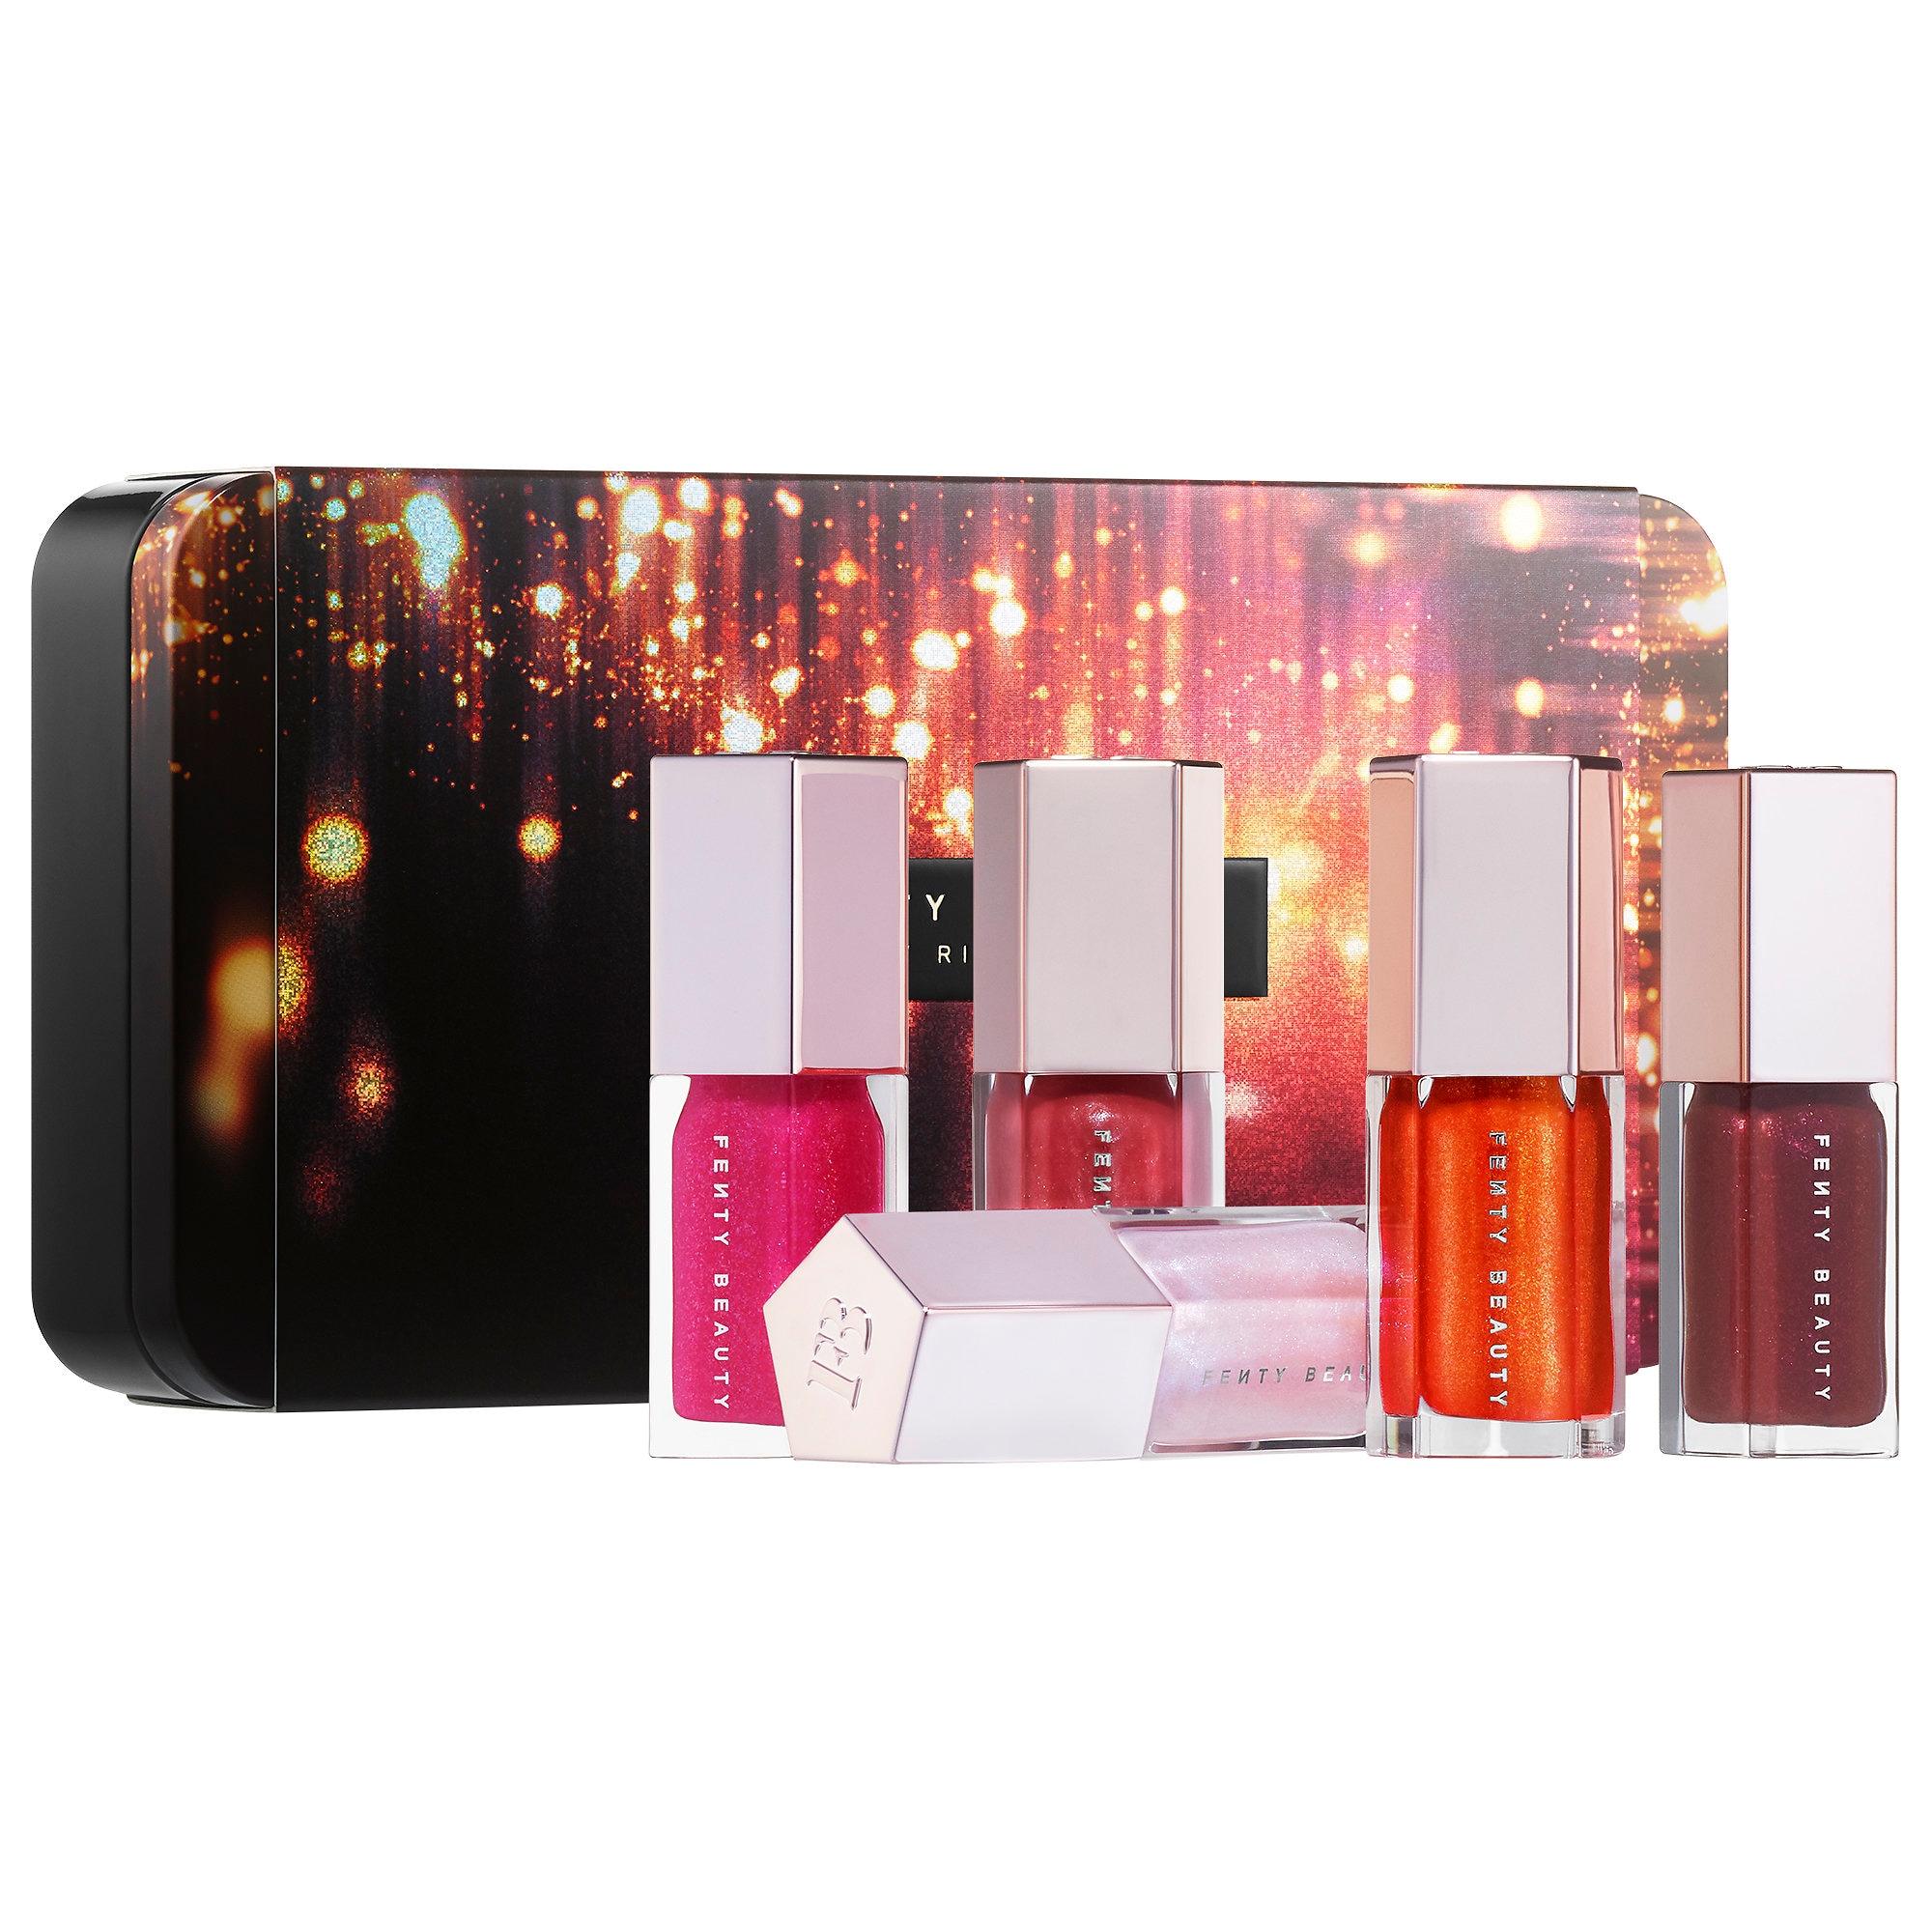 FENTY BEAUTY by Rihanna Glossy Posse Mini Gloss Bomb Set 5 x 5.5 ml